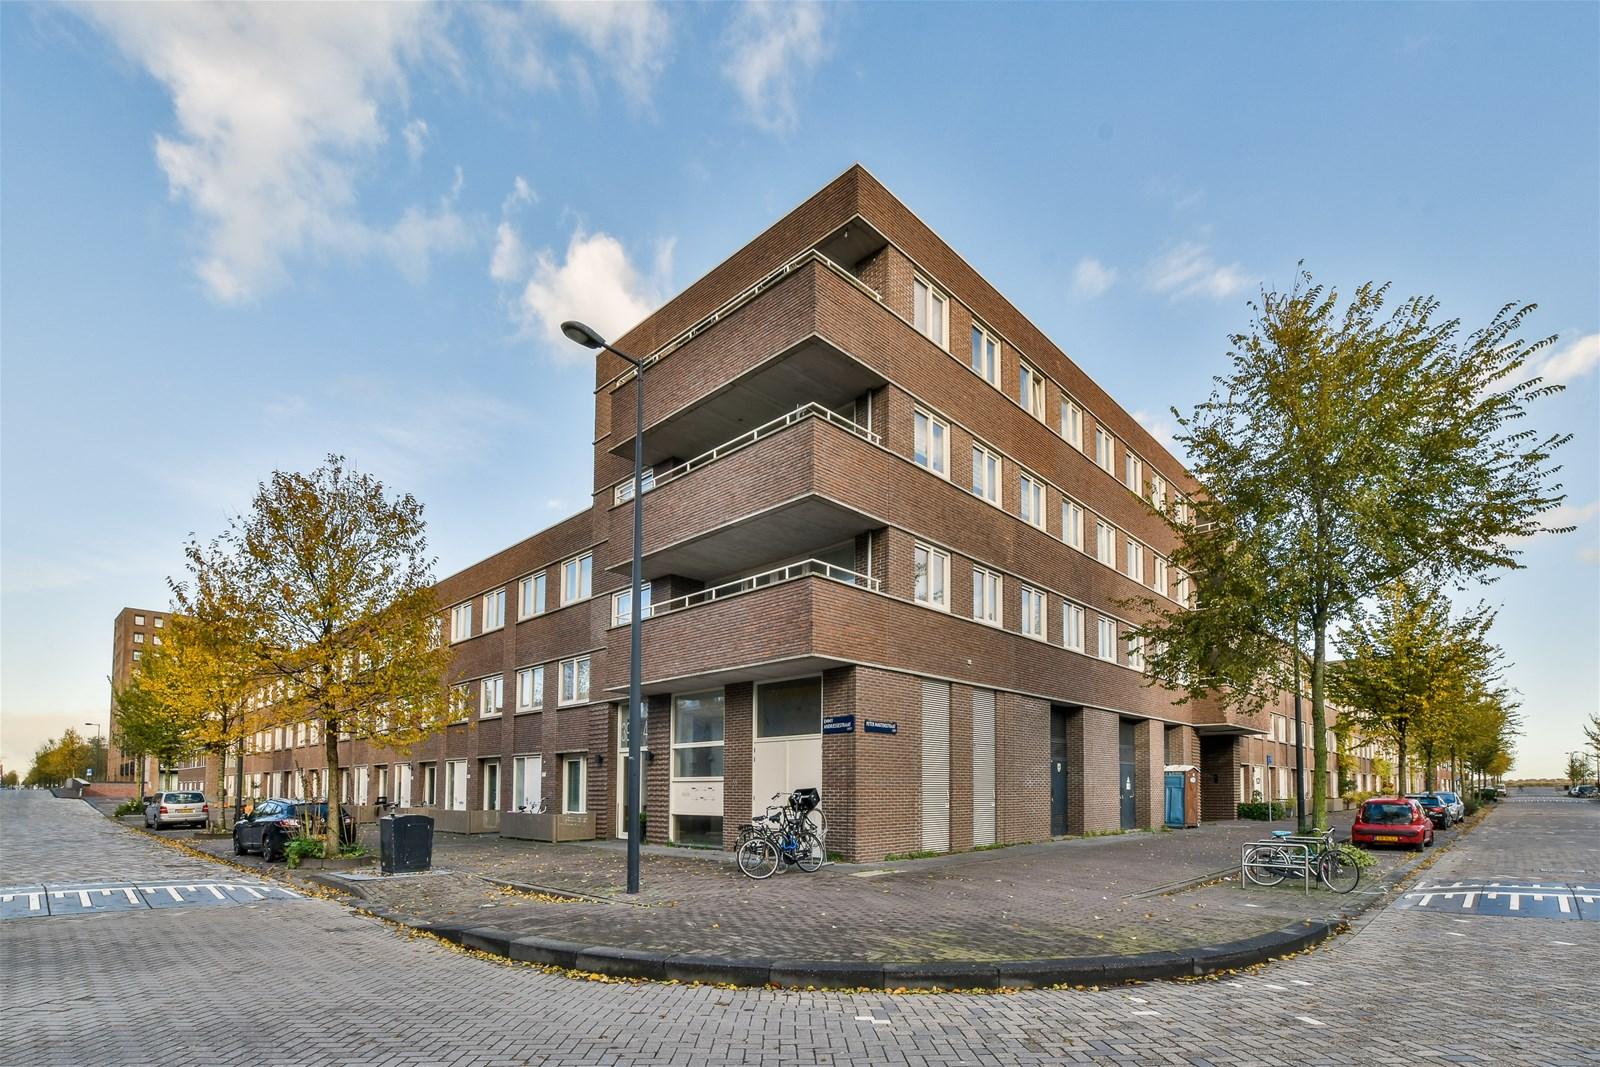 Wonen In Ijburg : Emmy andriessestraat amsterdam ijburg zuid vhm makelaars